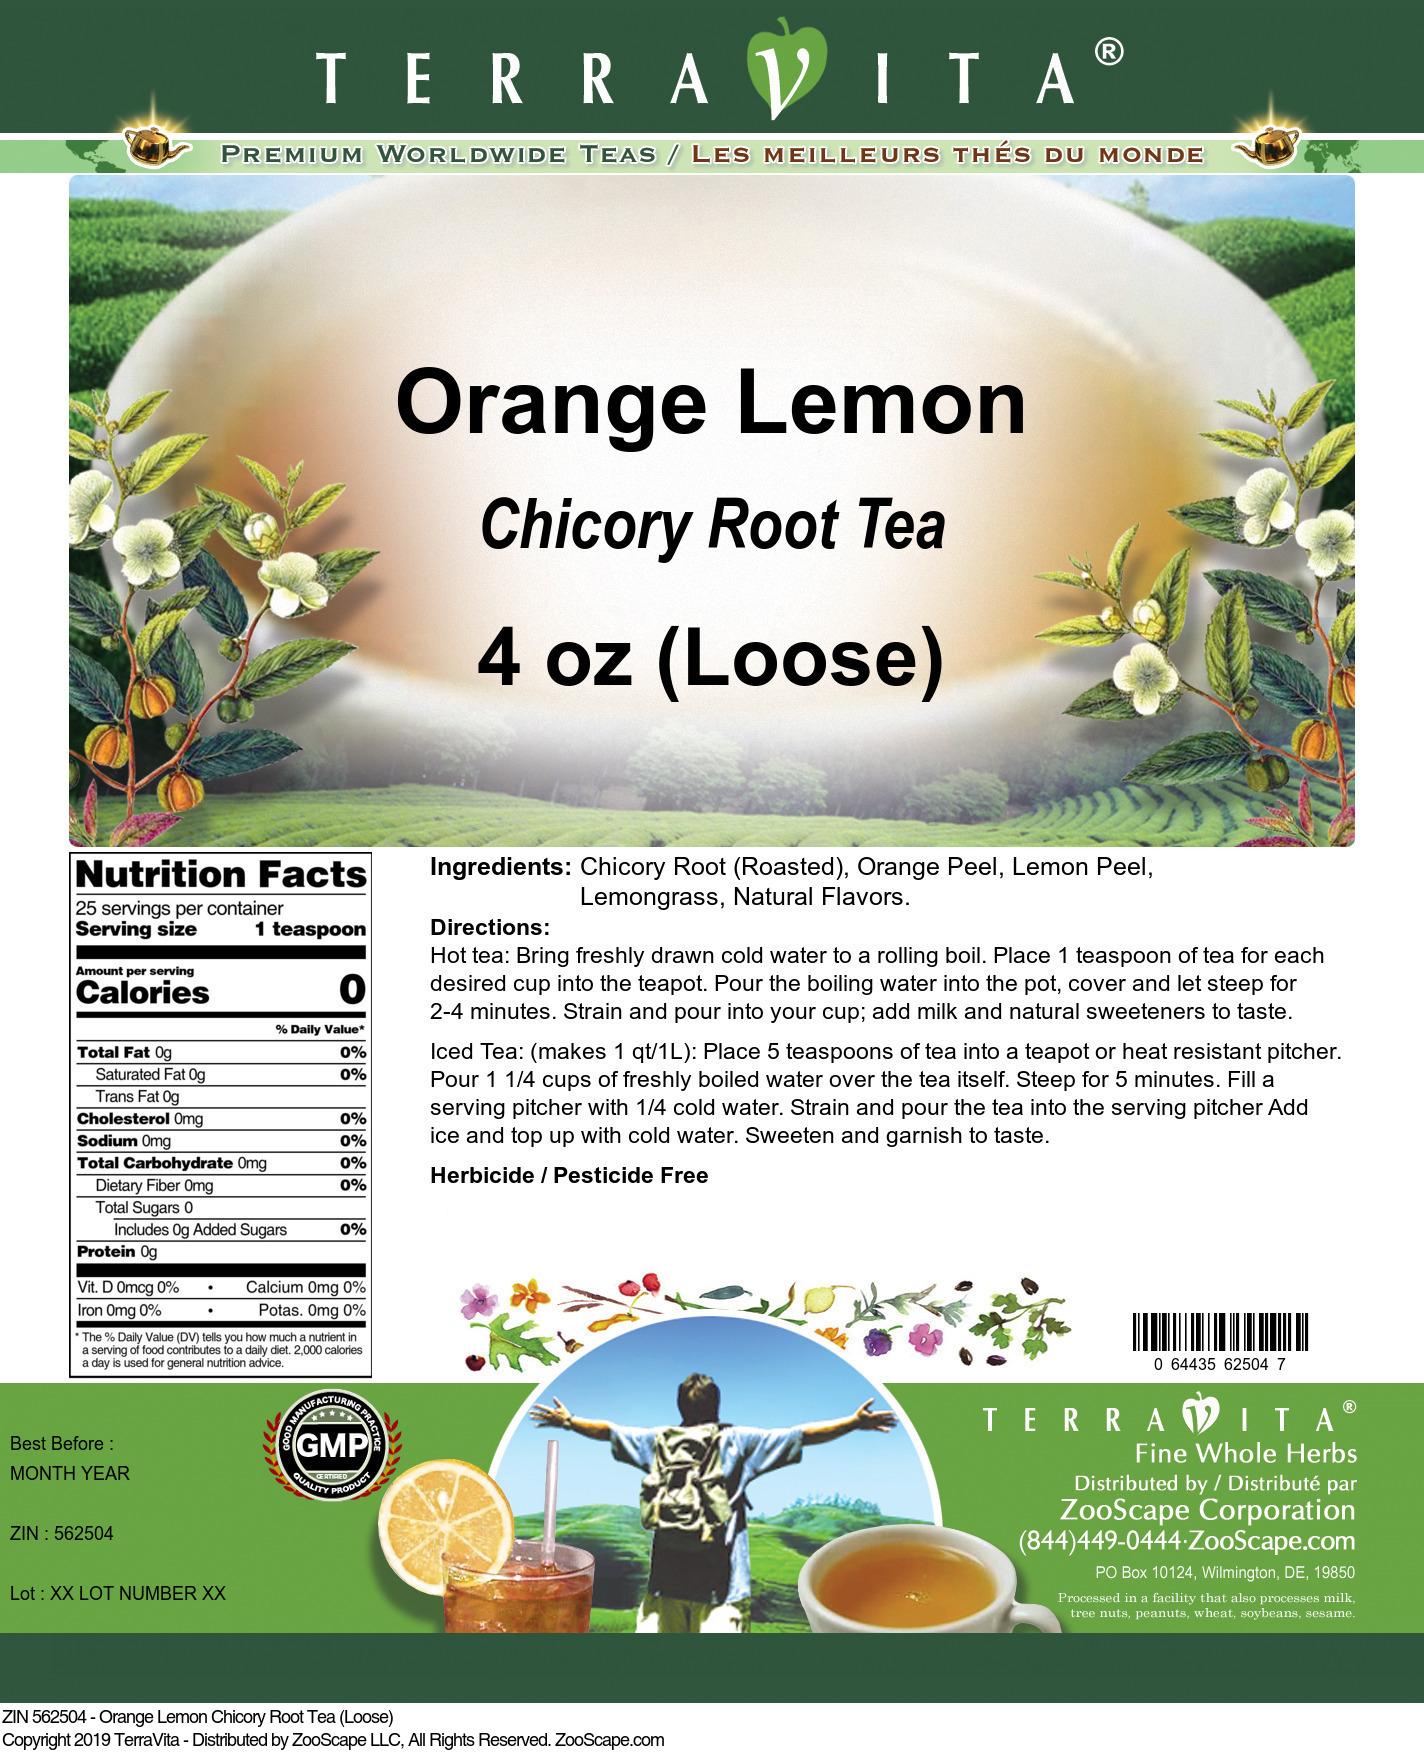 Orange Lemon Chicory Root Tea (Loose)